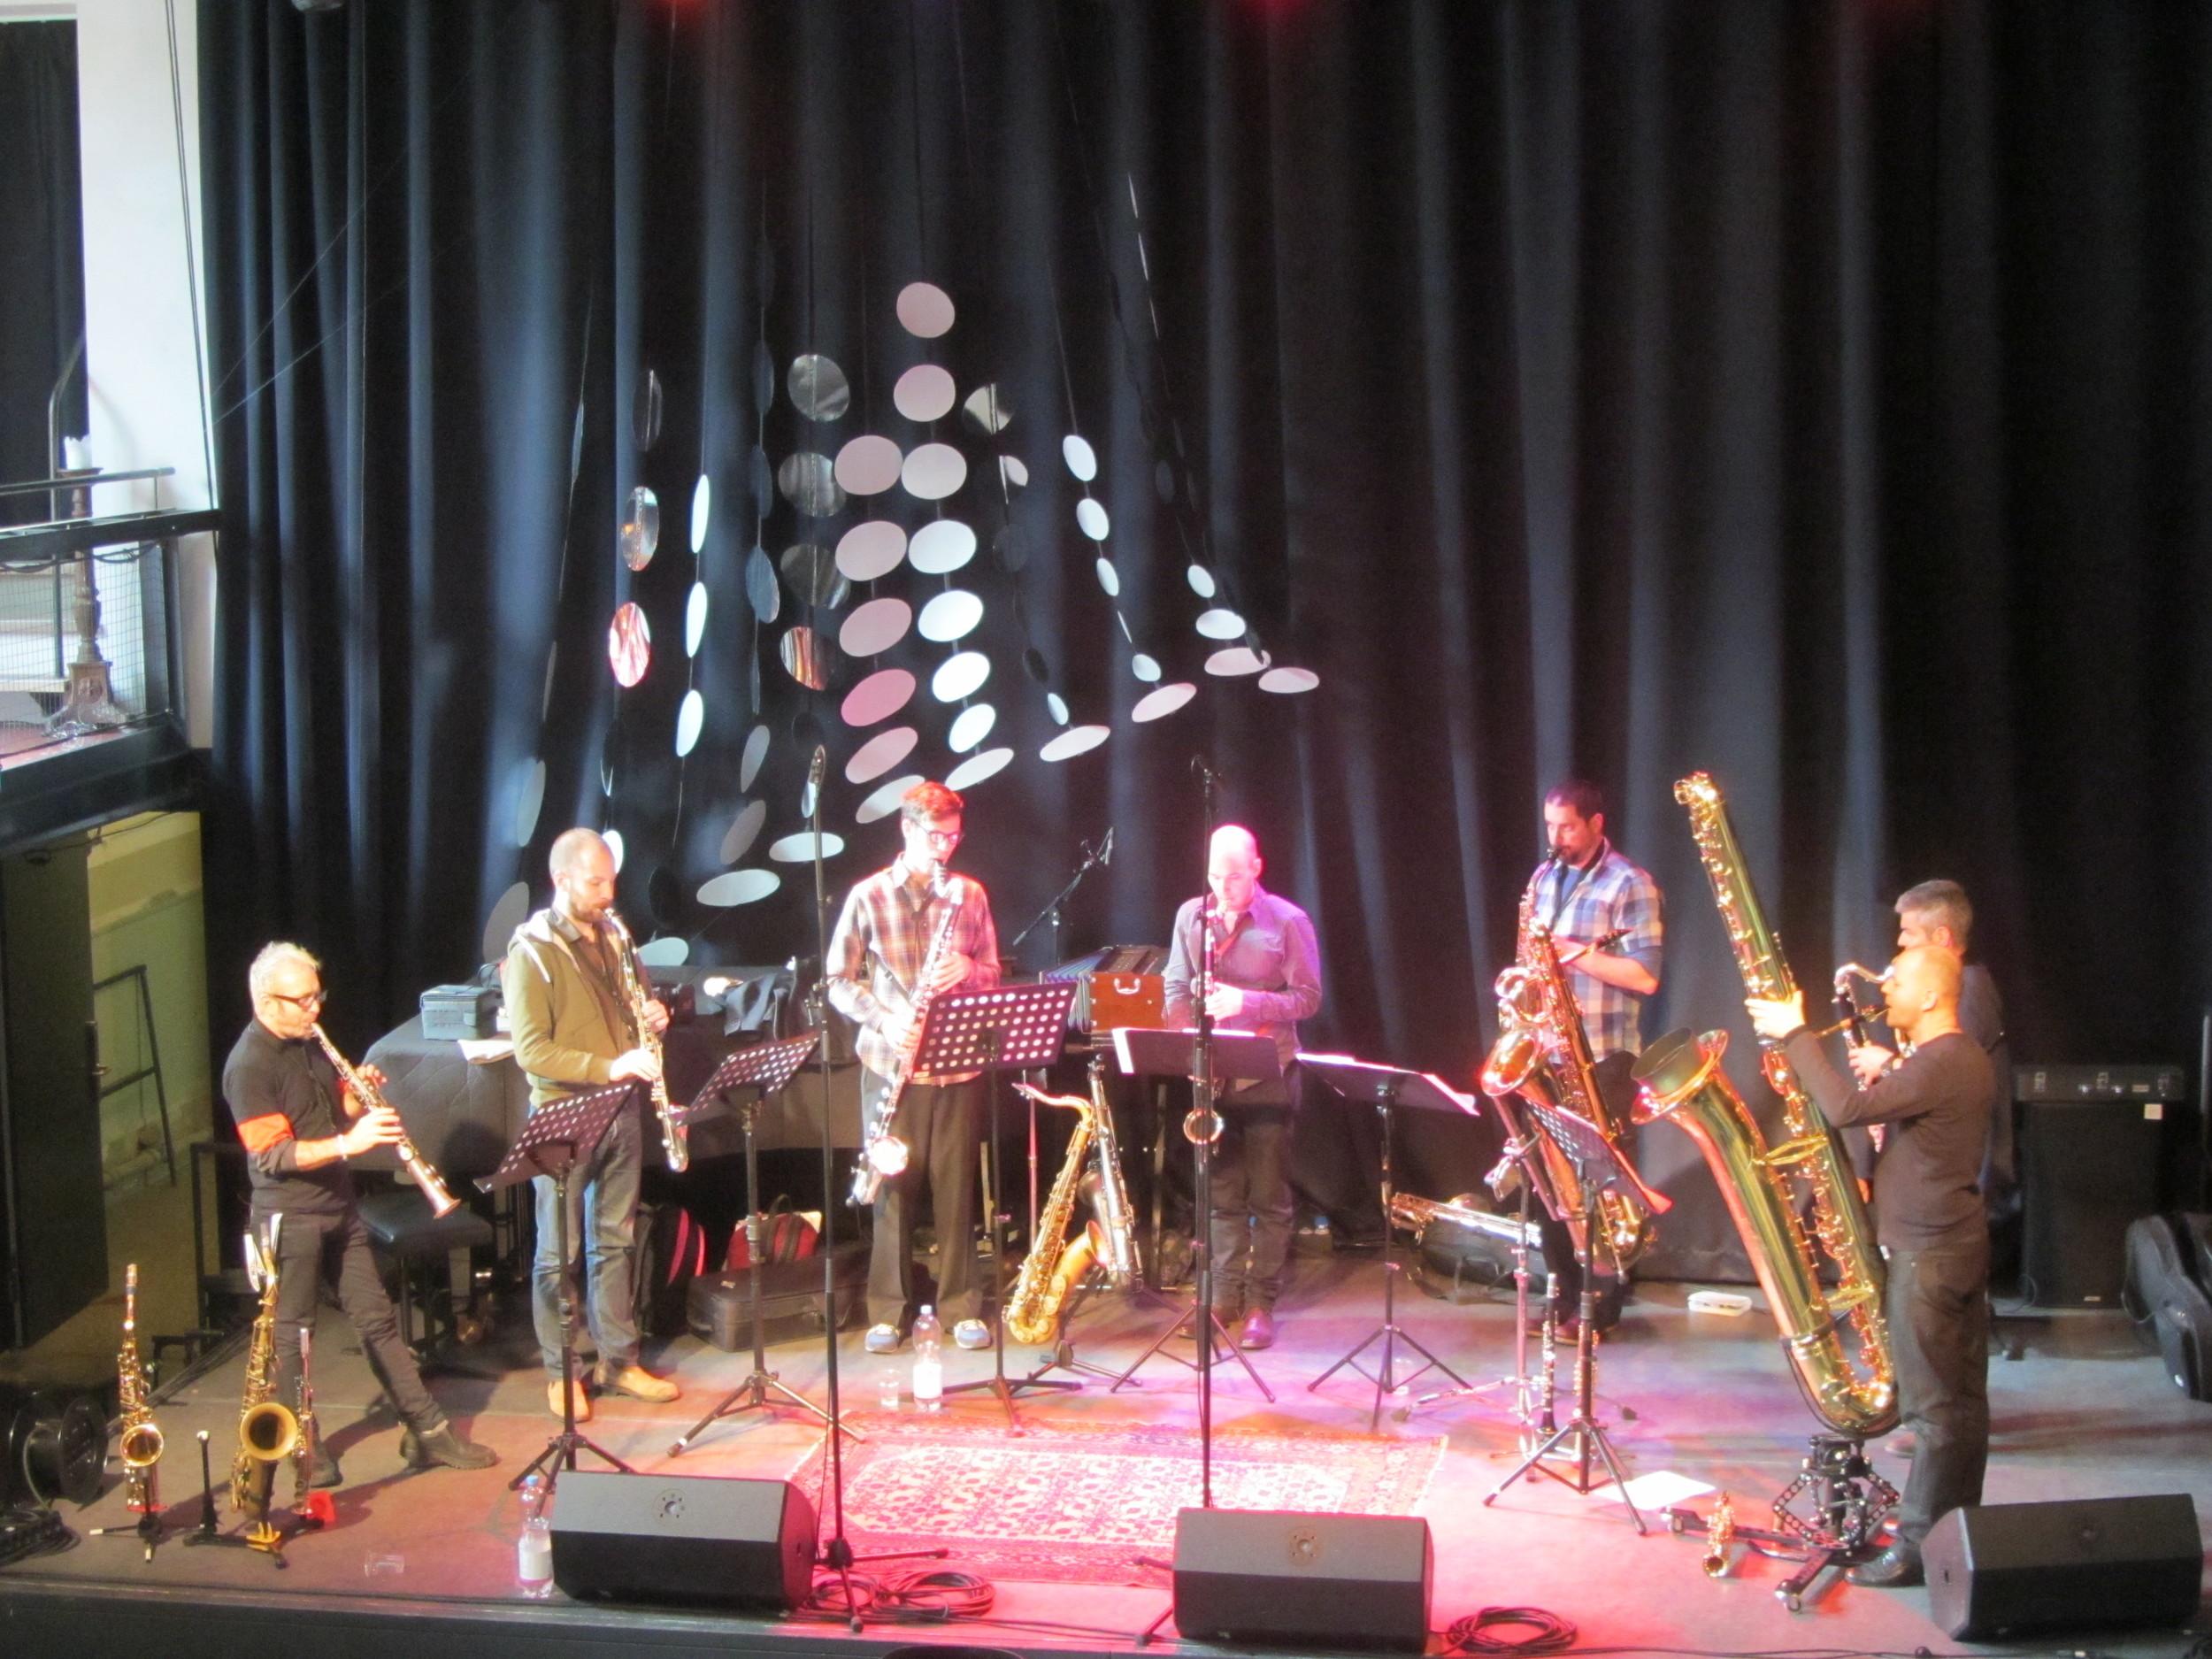 Jazzwerkstatt, Bern Switzerland 2013